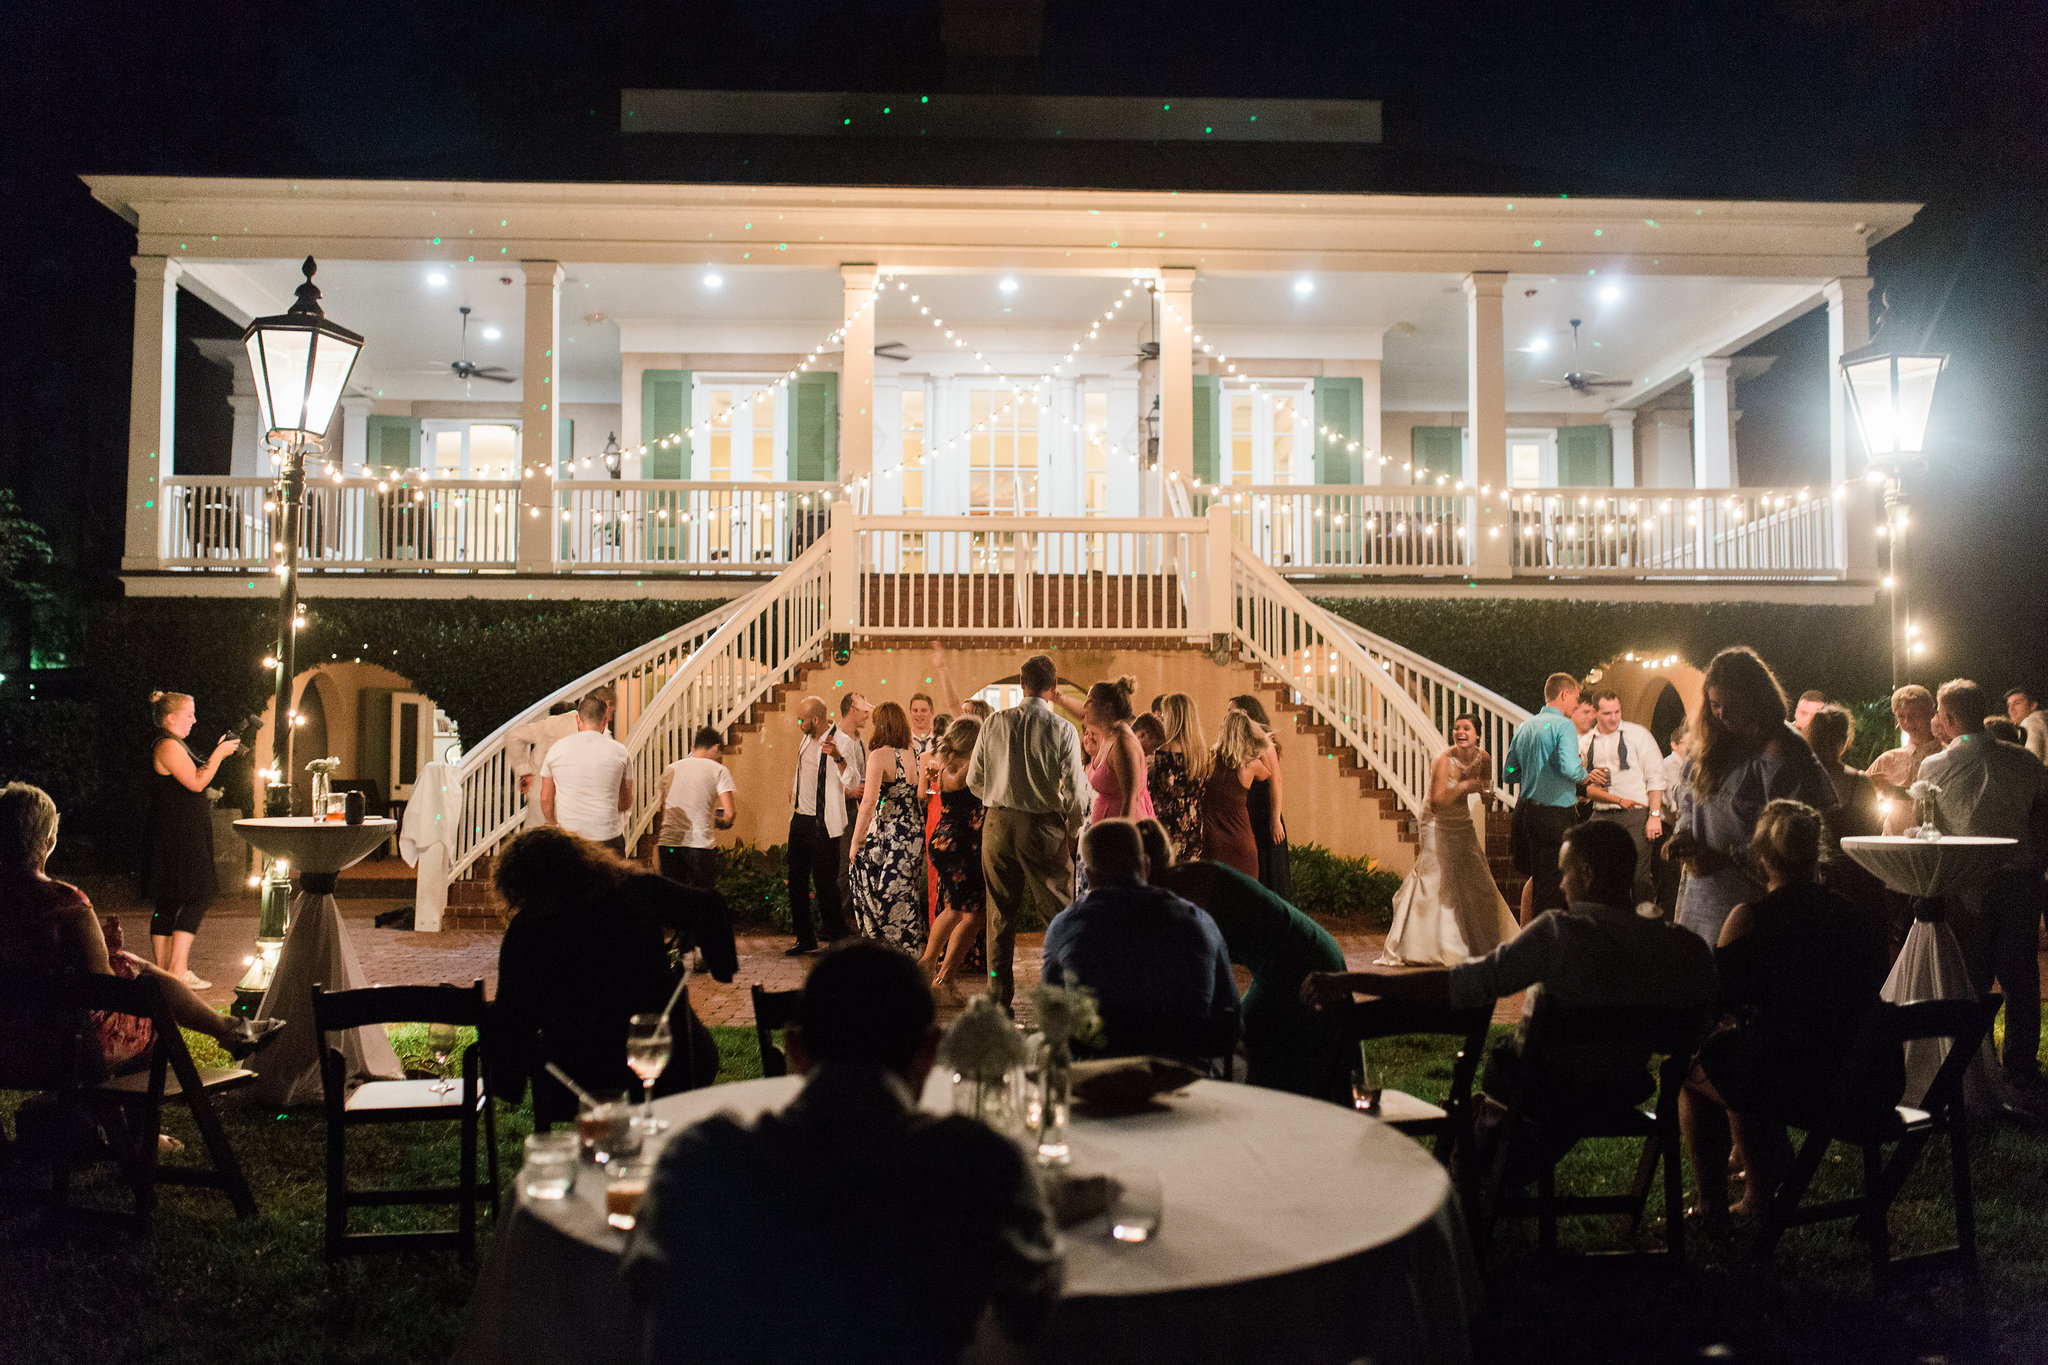 apt-b-photography-lauren-graham-oldfield-wedding-south-carolina-wedding-photographer-savannah-wedding-lowcountry-wedding-coastal-wedding-evening-wedding-cafe-lights-32JPG.JPG